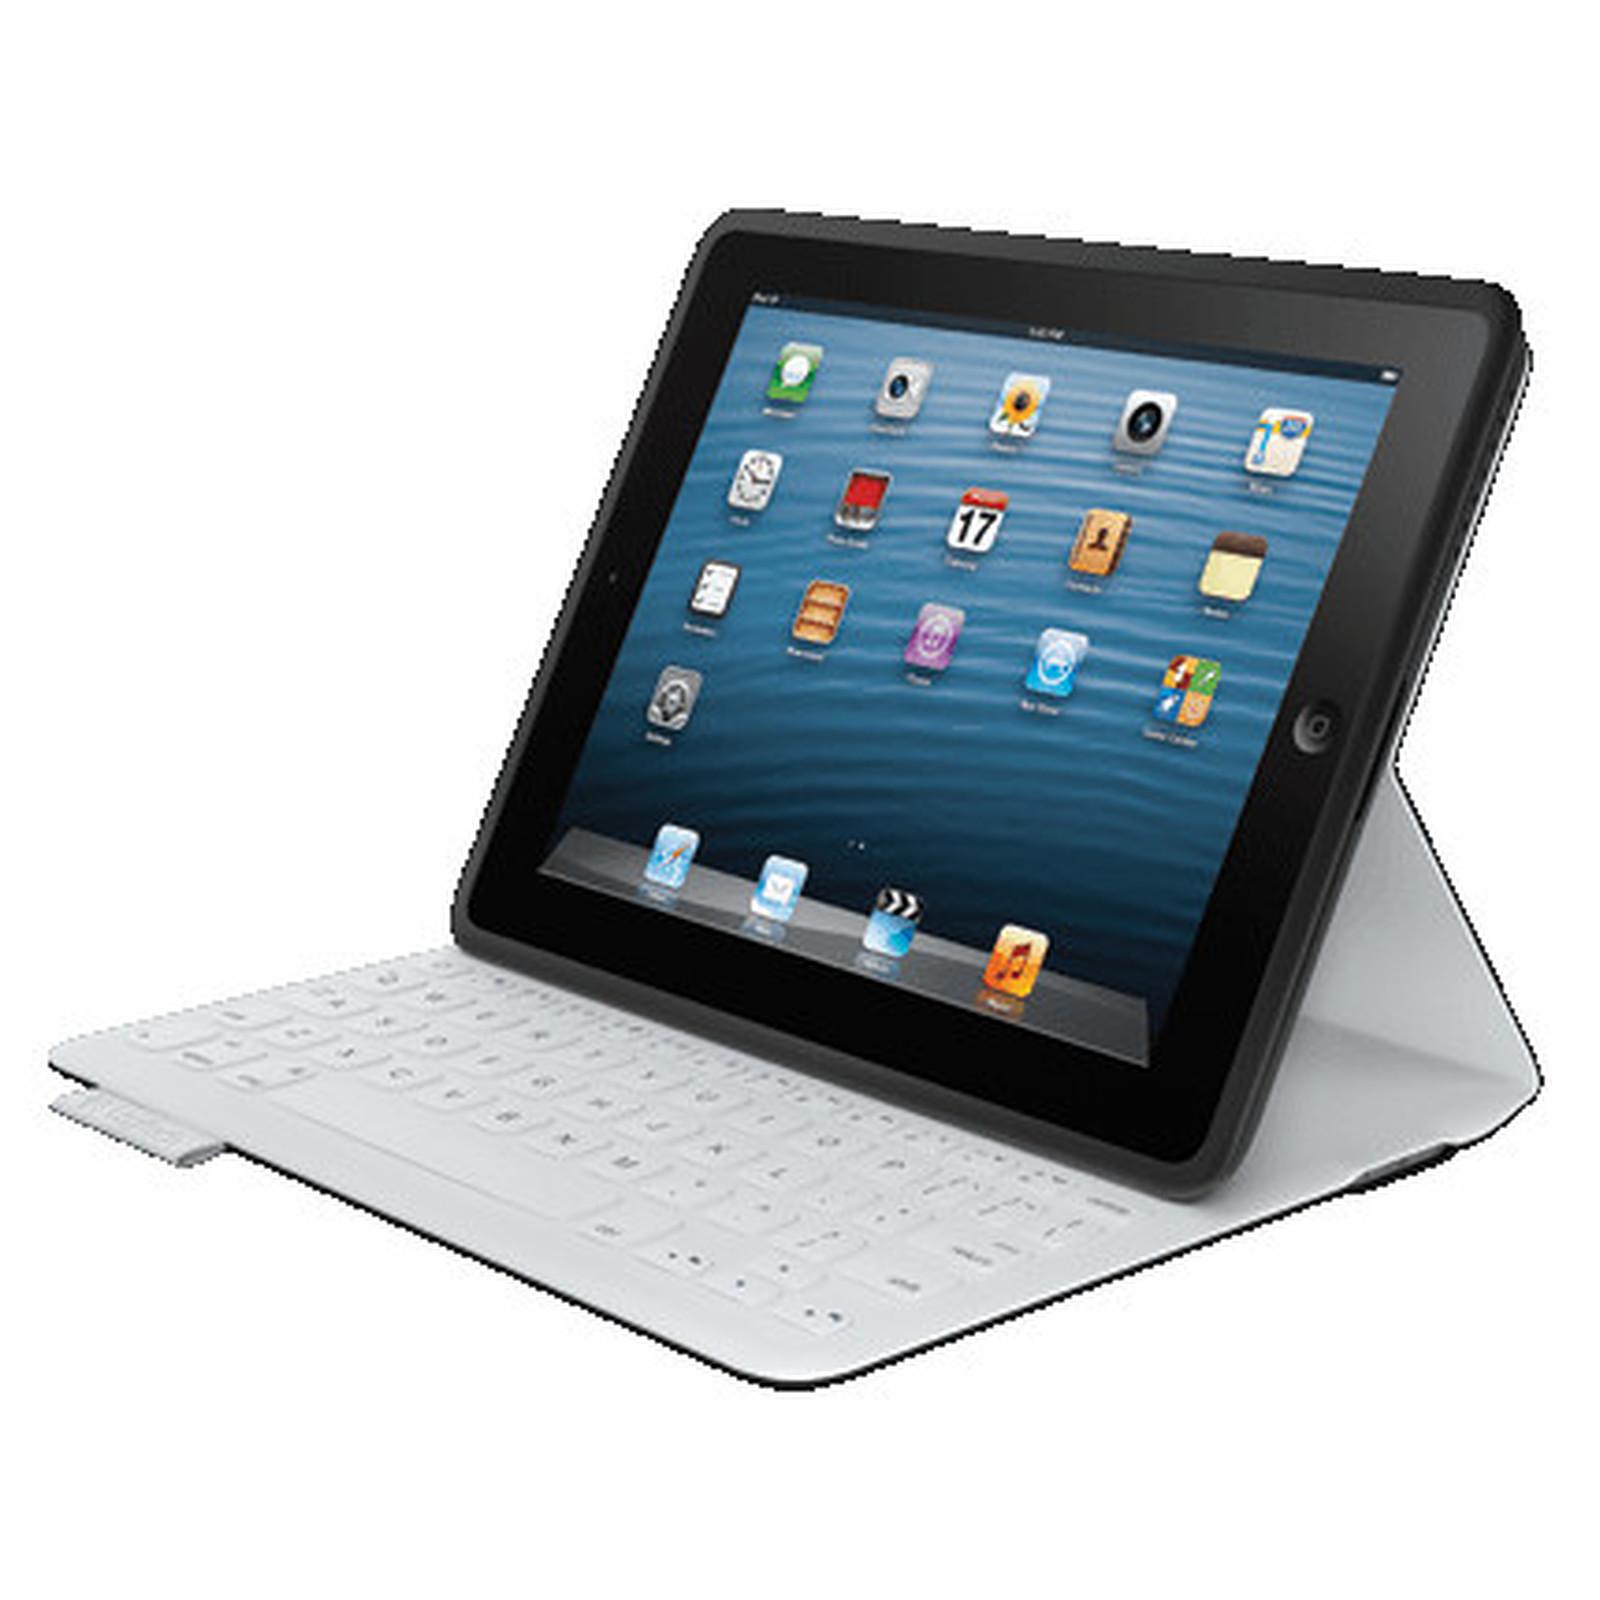 Logitech FabricSkin Keyboard Folio (Carbon Black)